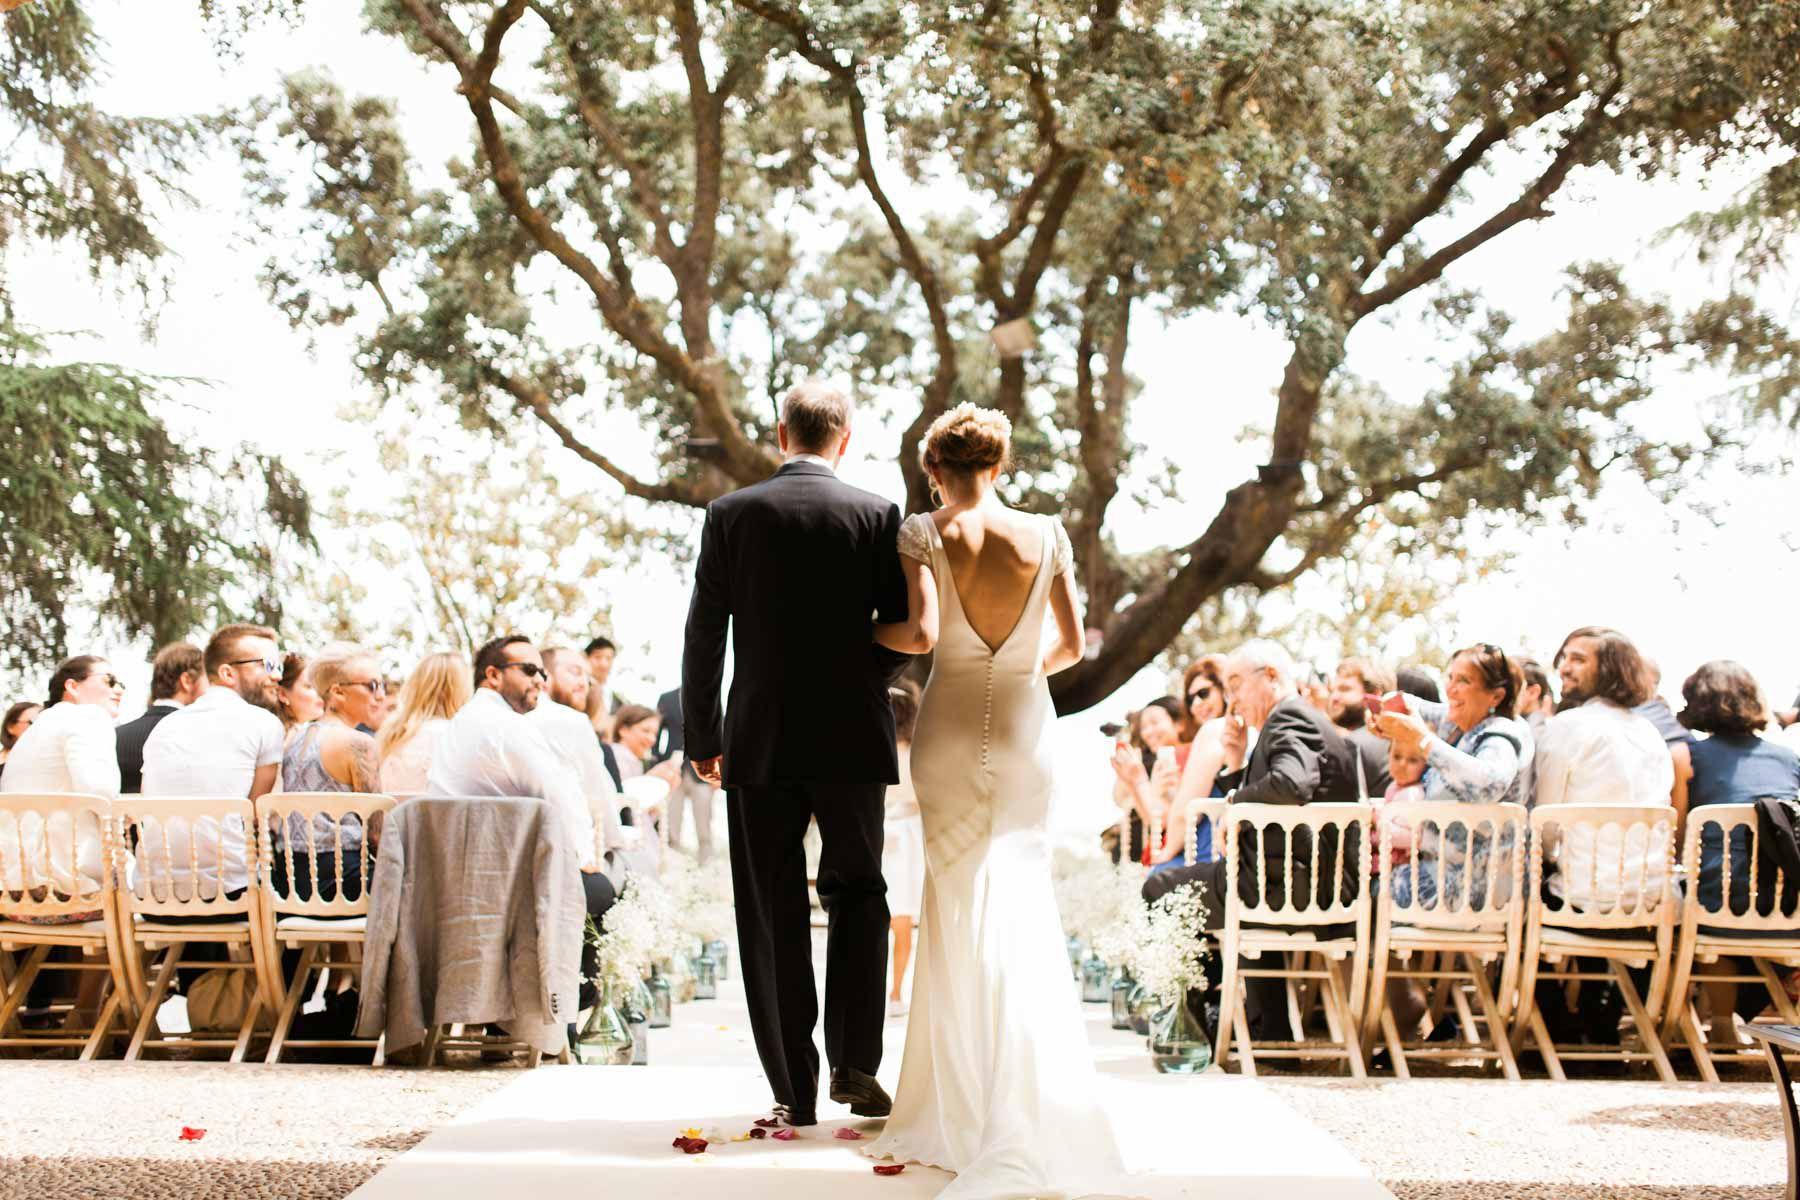 Teppei & Laura_0090 fotografo de bodas cigarral de las mercedes